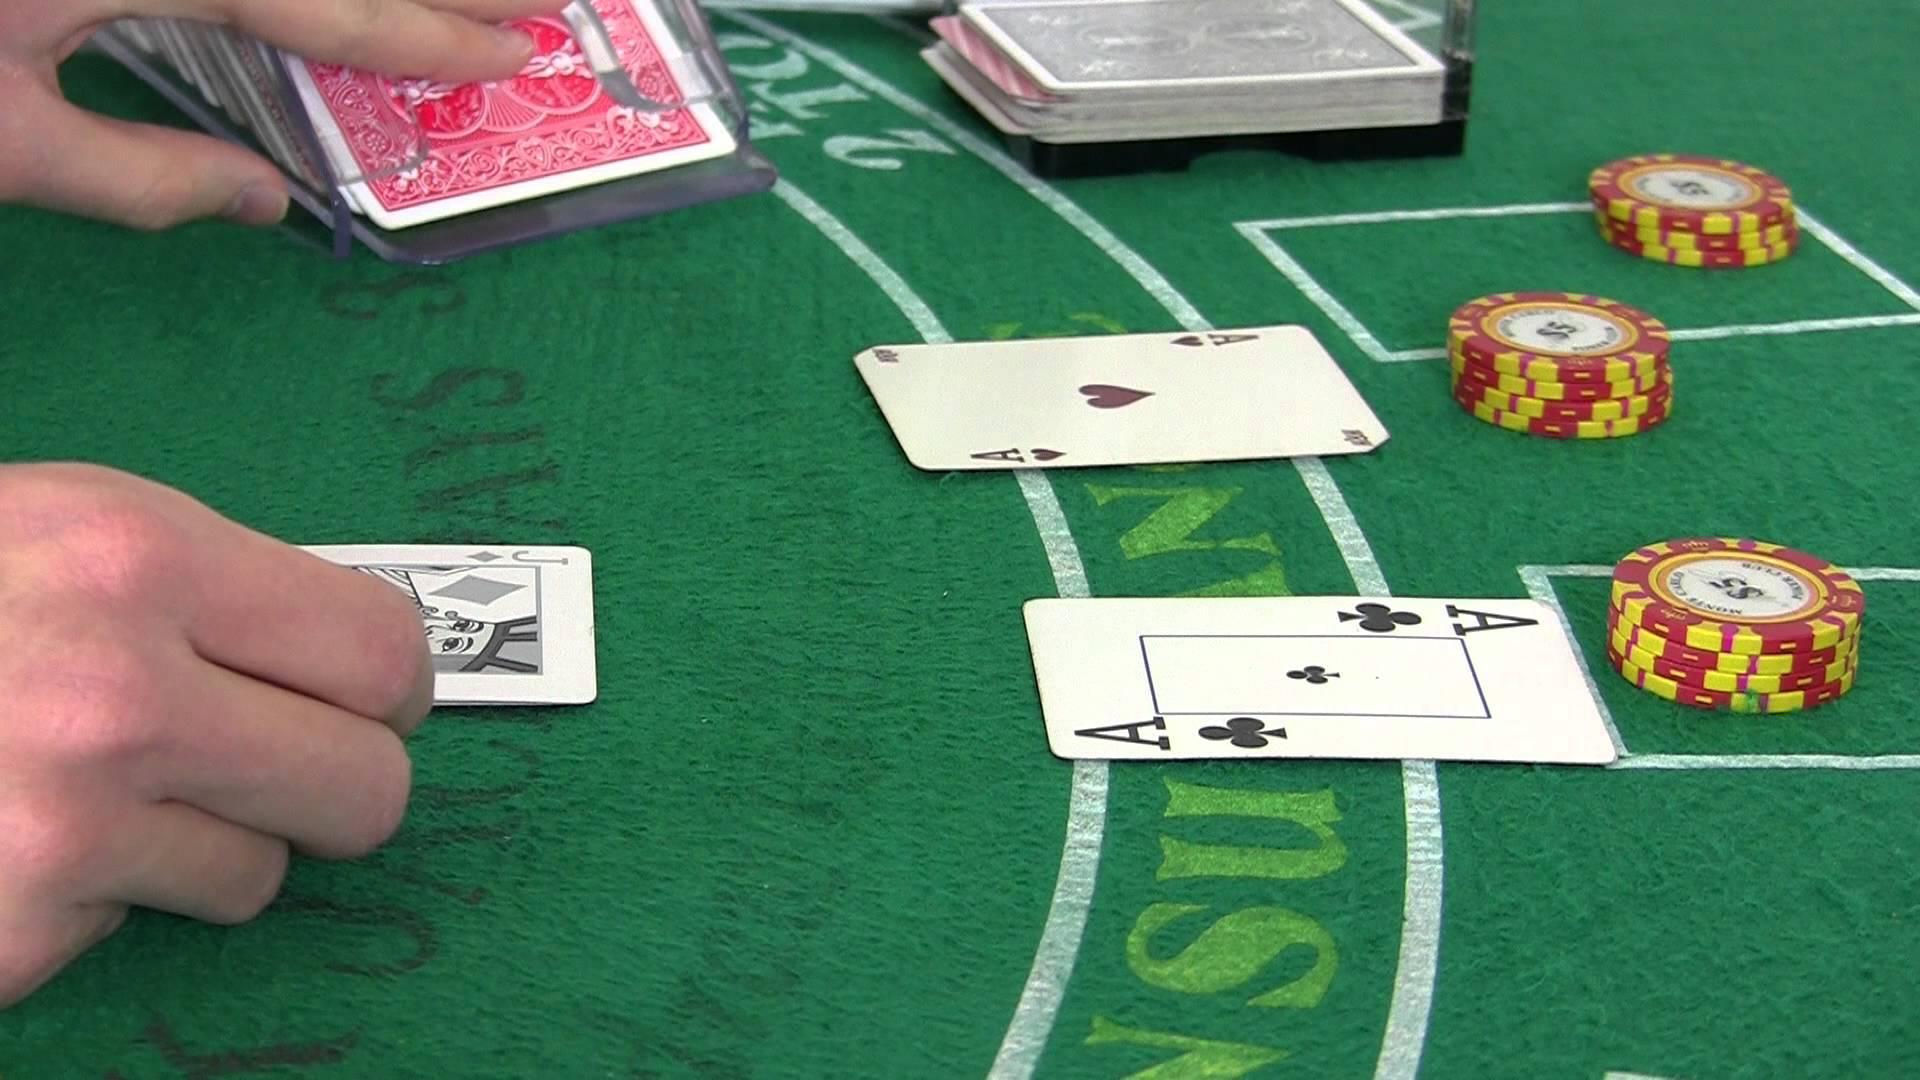 Blackjack: comment s'y lancer correctement?